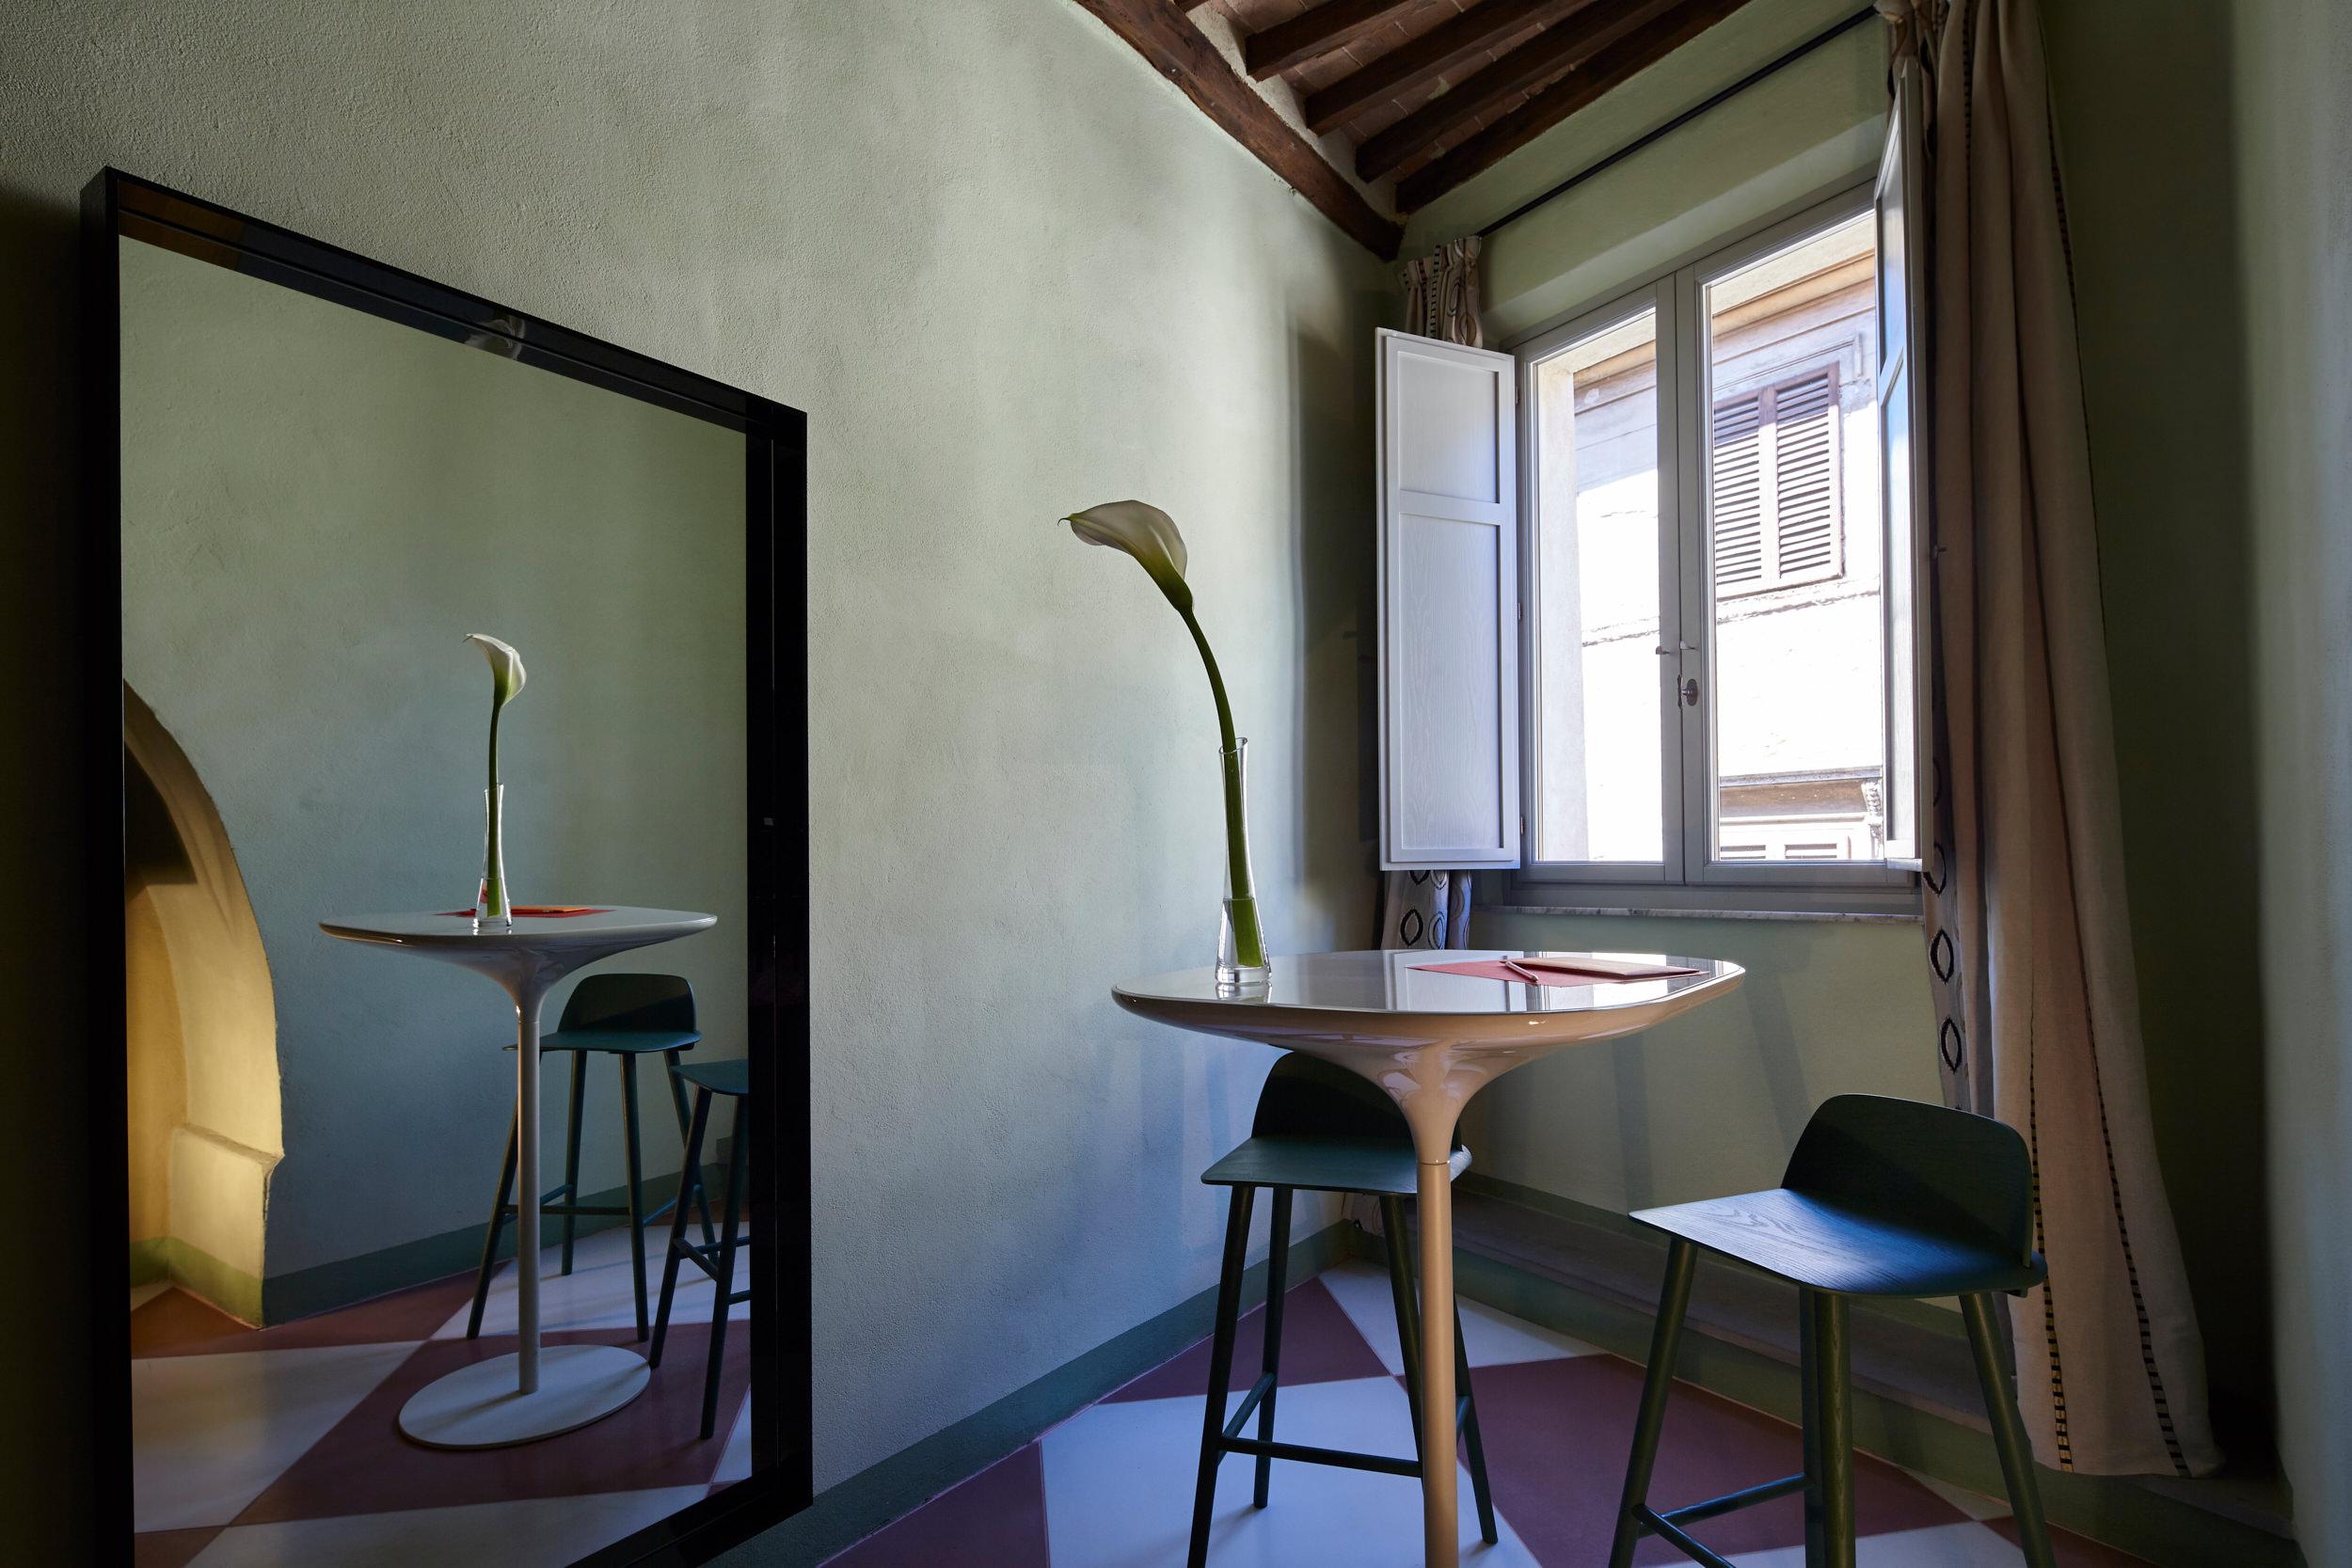 chambre 5 hotel siena palazzetto rosso. Black Bedroom Furniture Sets. Home Design Ideas